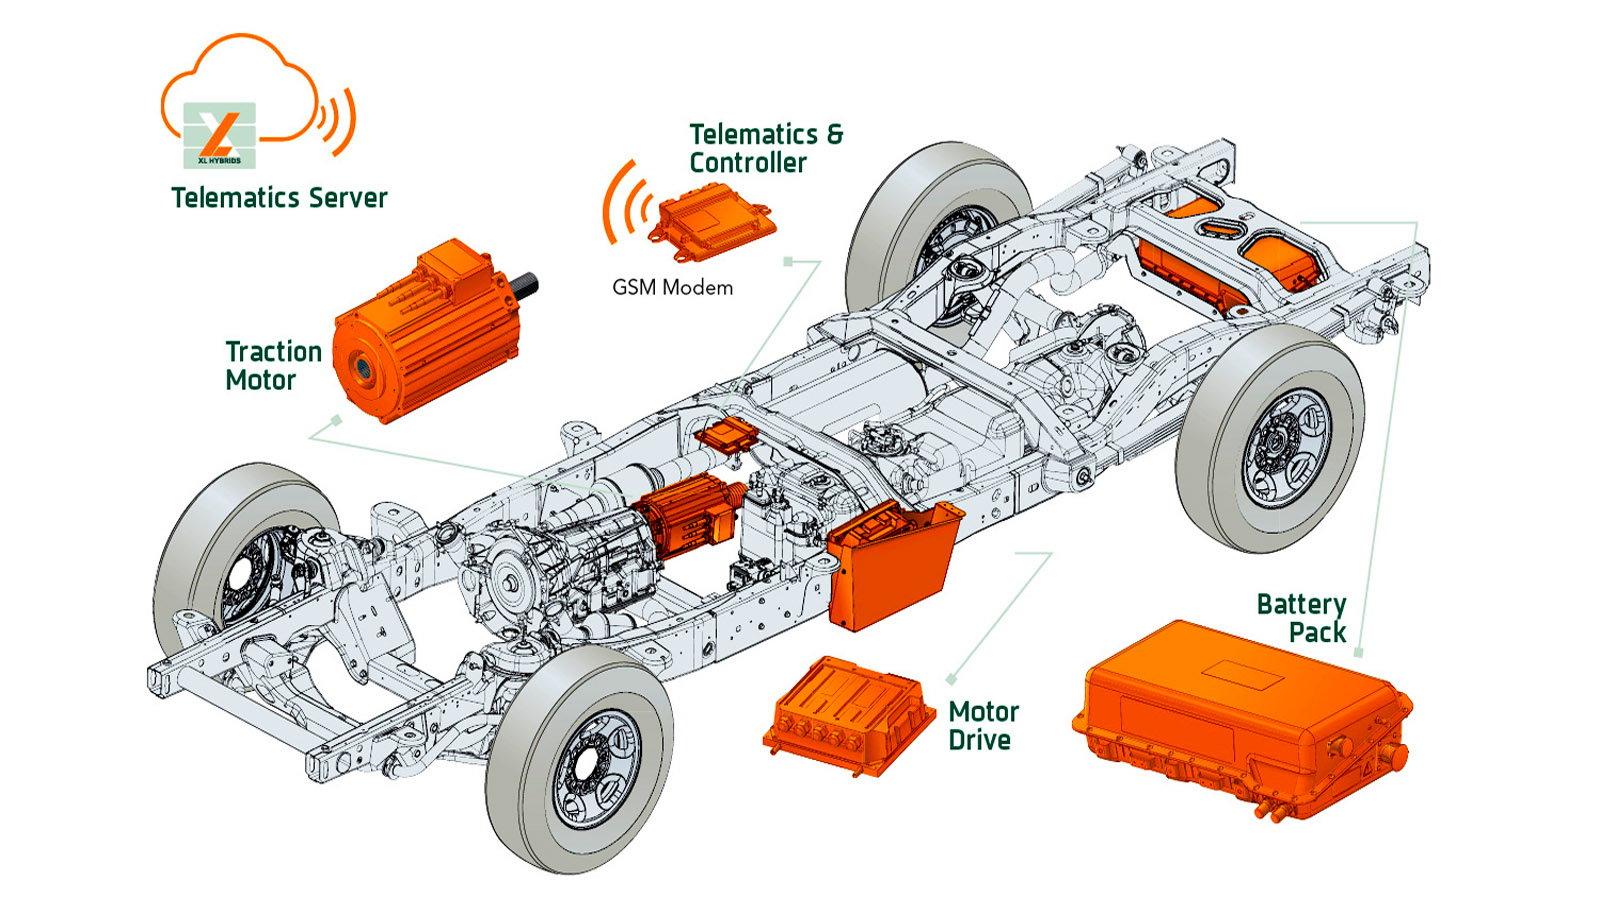 XL Hybrids F-Series